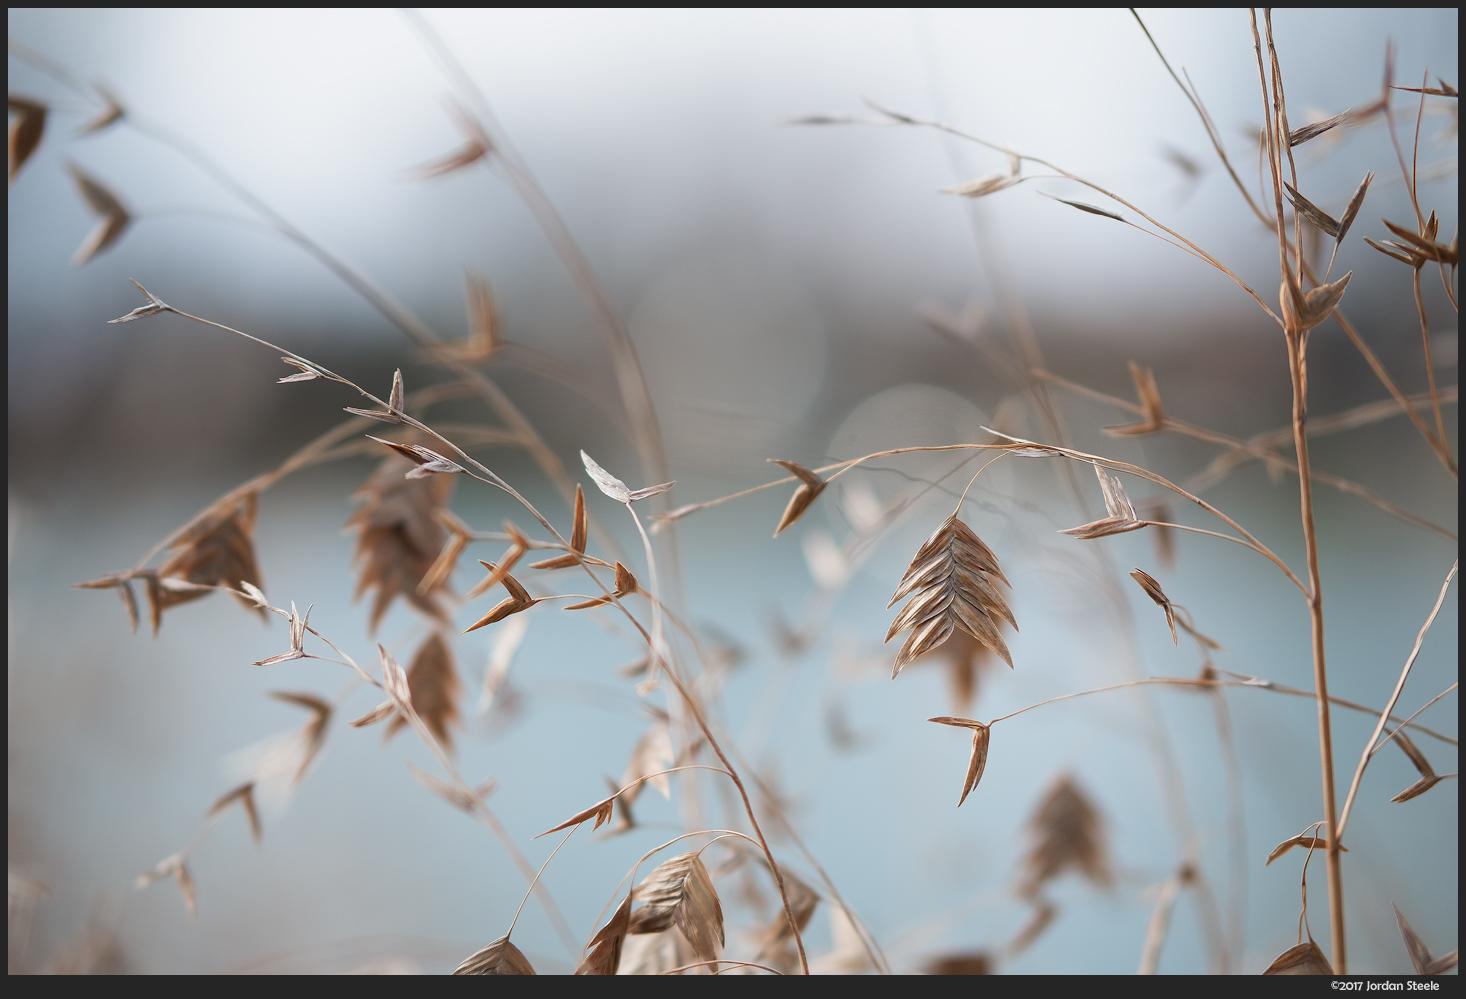 Grass - Fujifilm X-T20 with Fujinon XF 50mm f/2 @ f/2